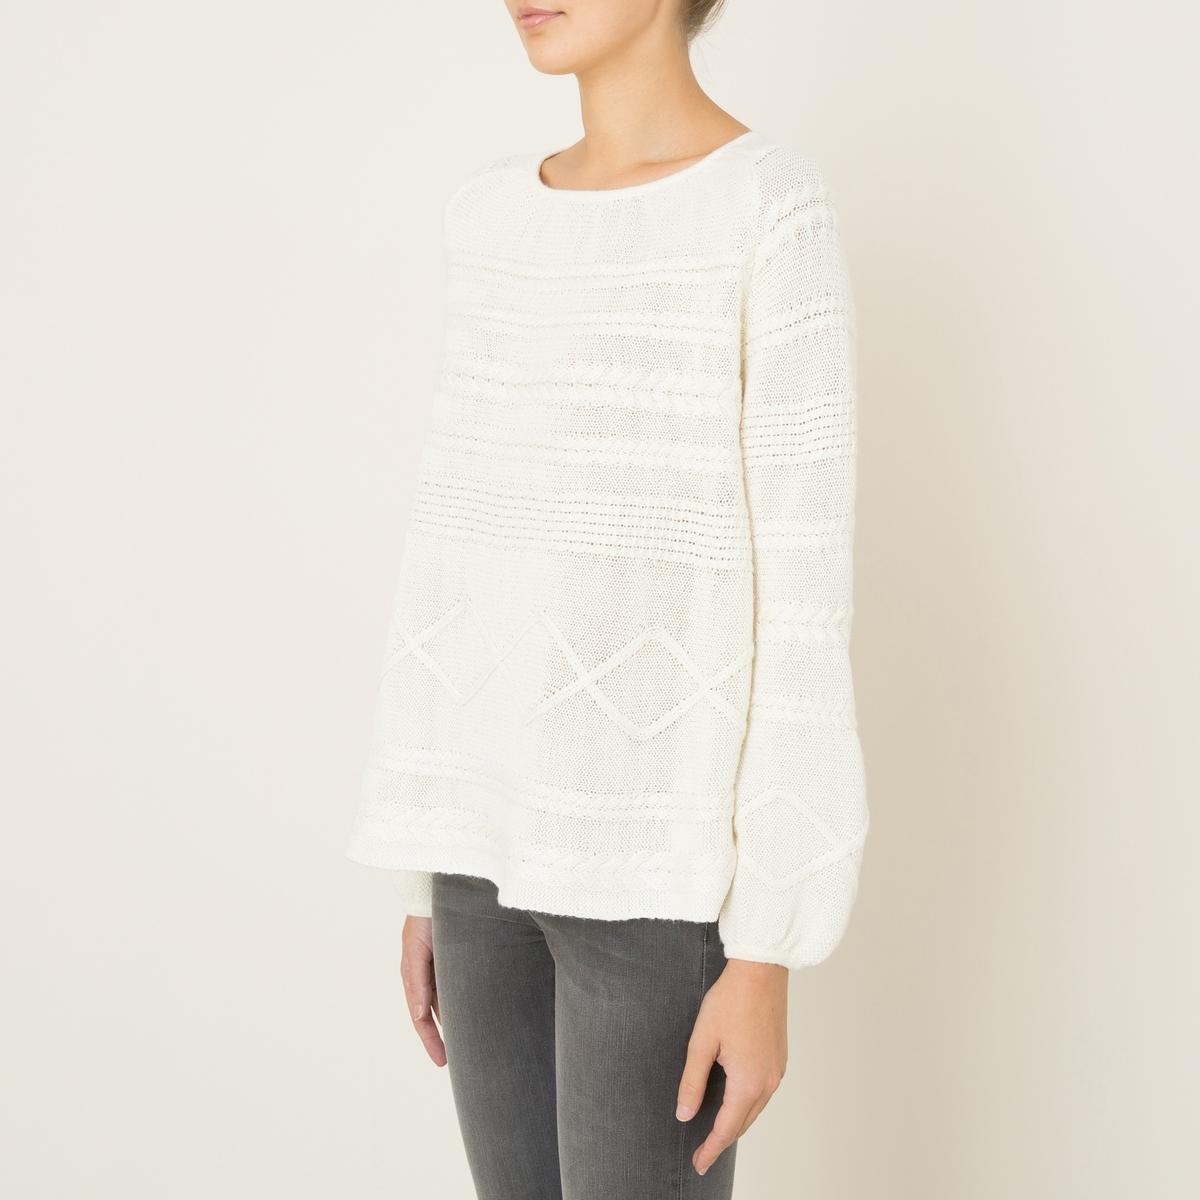 Пуловер MOODY от La Redoute